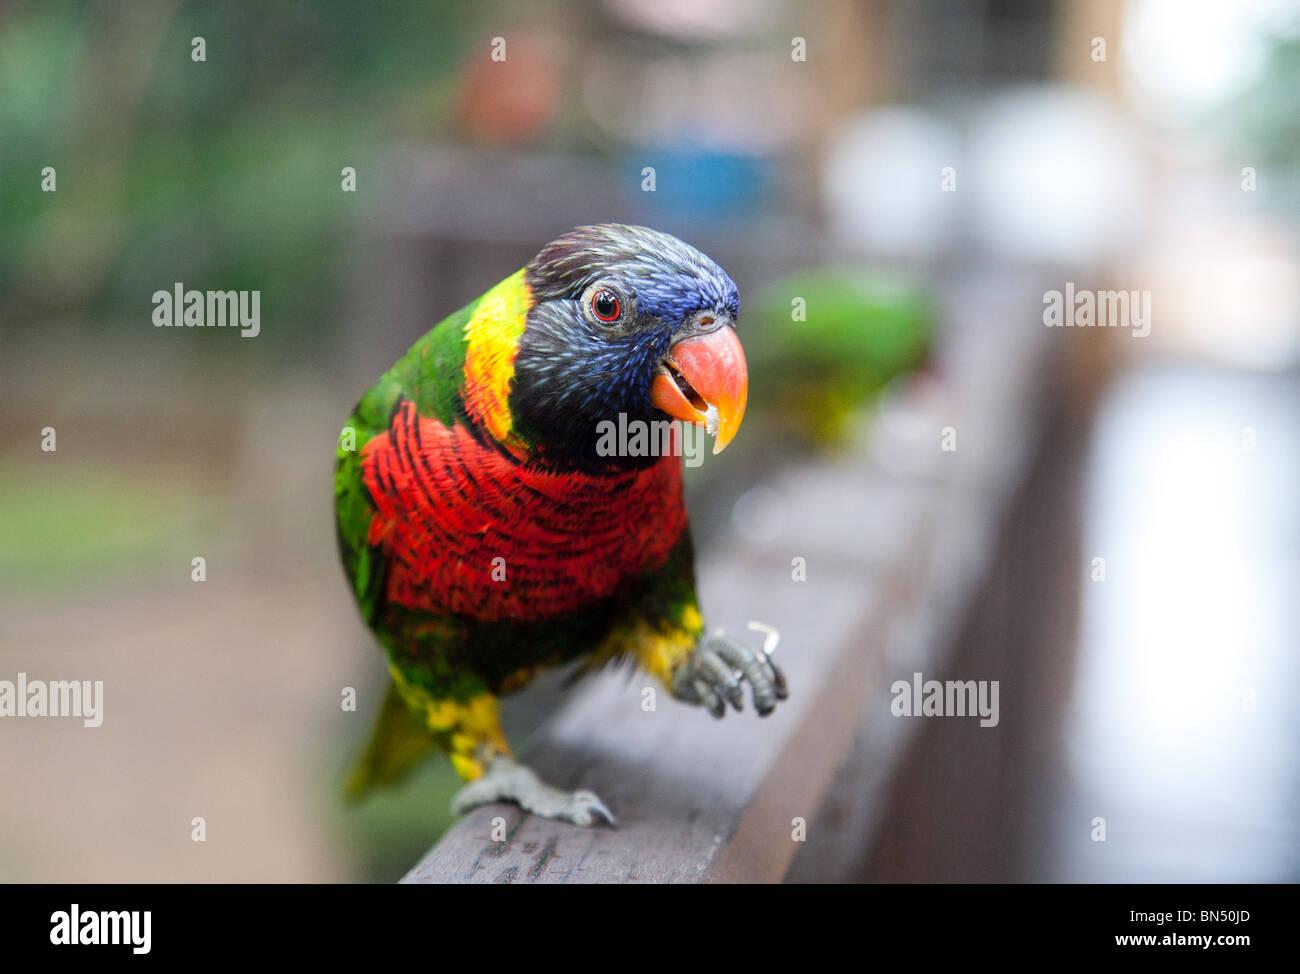 A Rainbow Lorikeet at the Kuala Lampur Bird Park - Stock Image